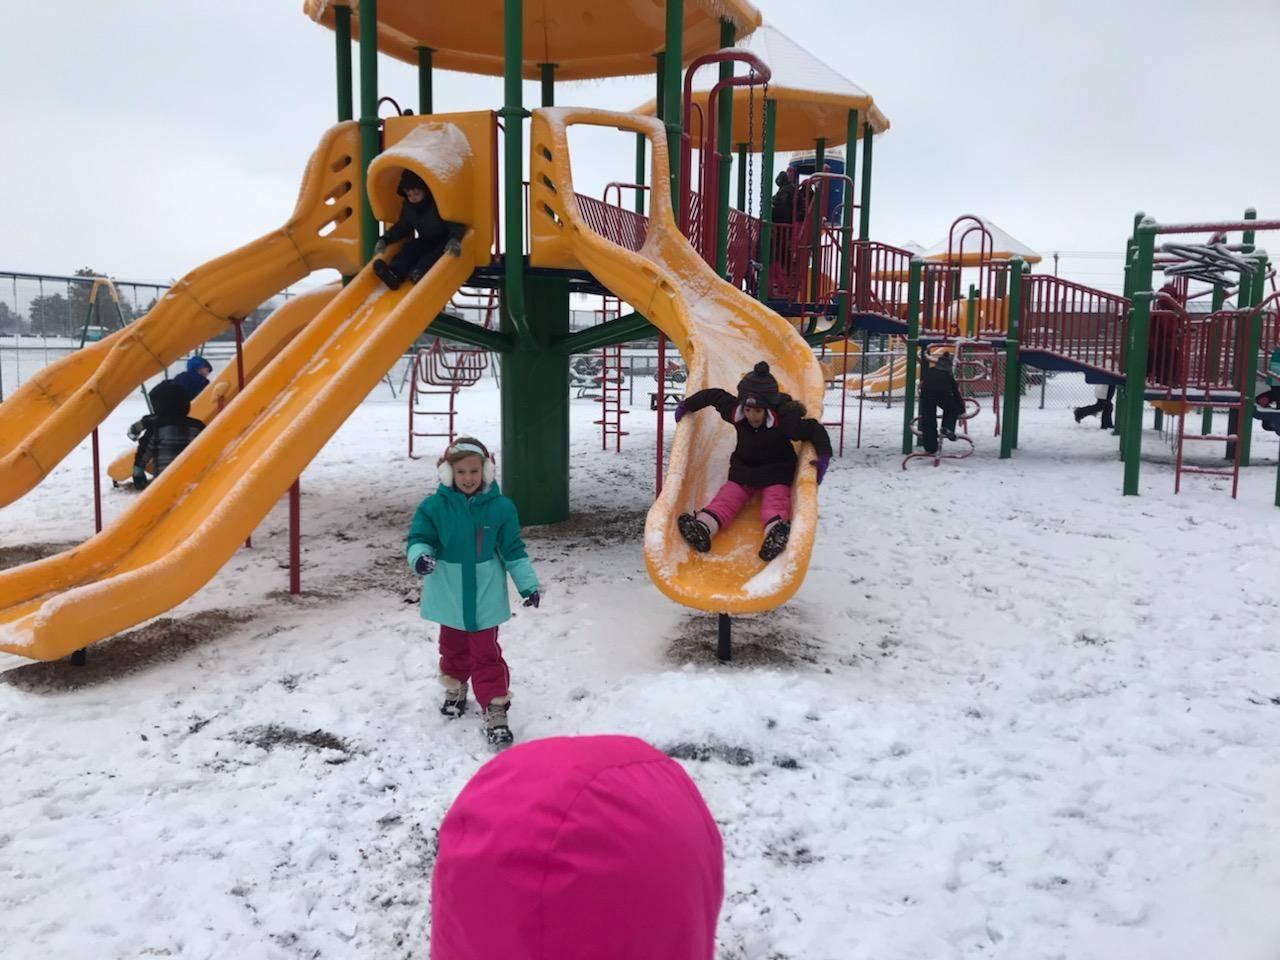 Snow makes it more fun!